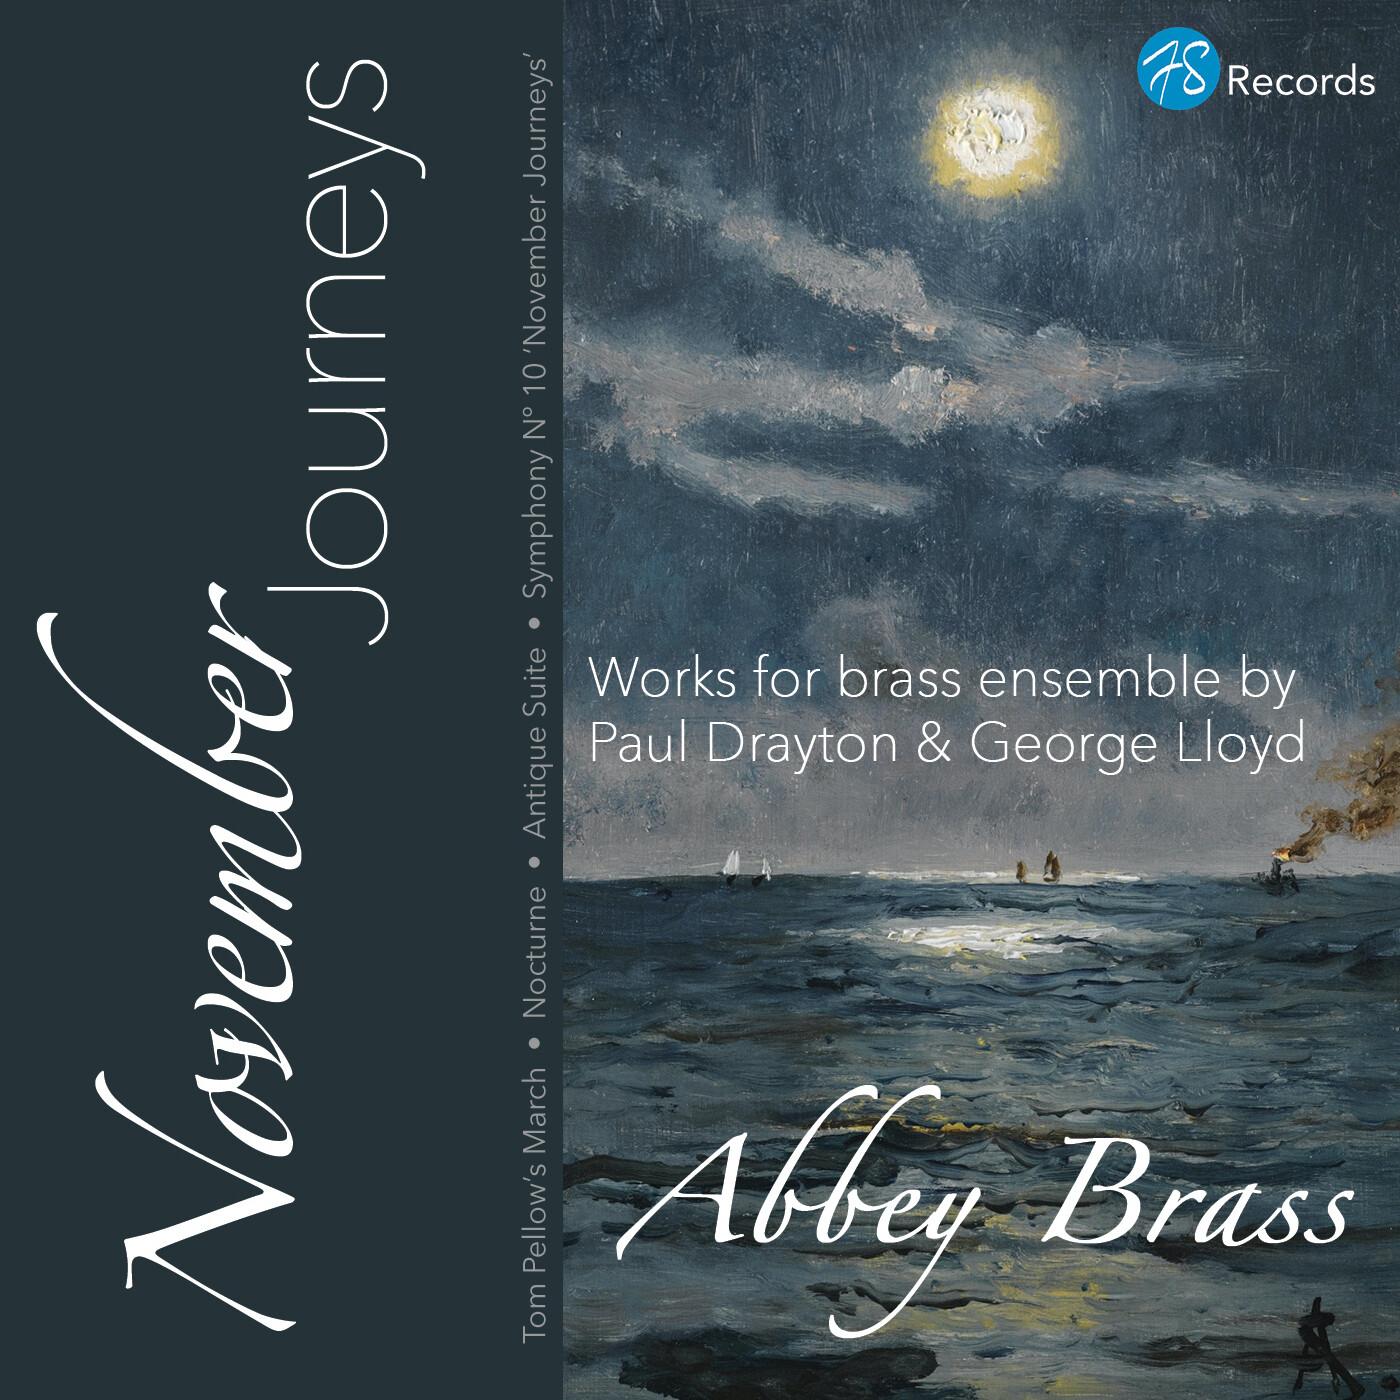 November Journeys: Works for brass ensemble by Paul Drayton & George Lloyd [CD]